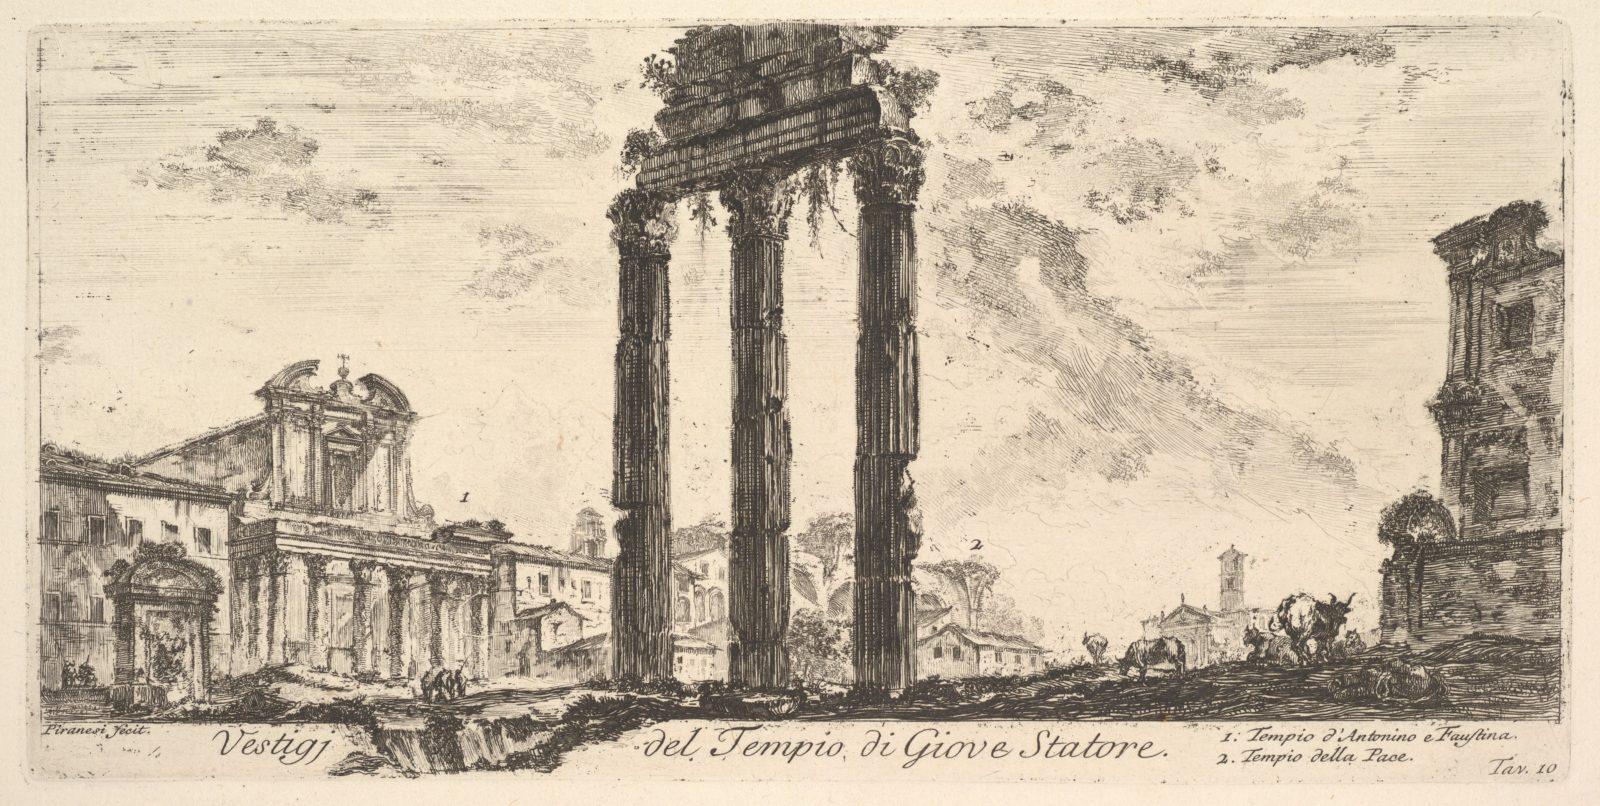 Plate 10: Ruins of the Temple of Jupiter Stator (Jupiter the Supporter). 1. Temple of Antoninus and Faustina. 2. Temple of Peace. (Vestigi del Tempio di Giove Statore. 1. Tempio d'Antonino e Faustina. 2. Tempio della Pace.)